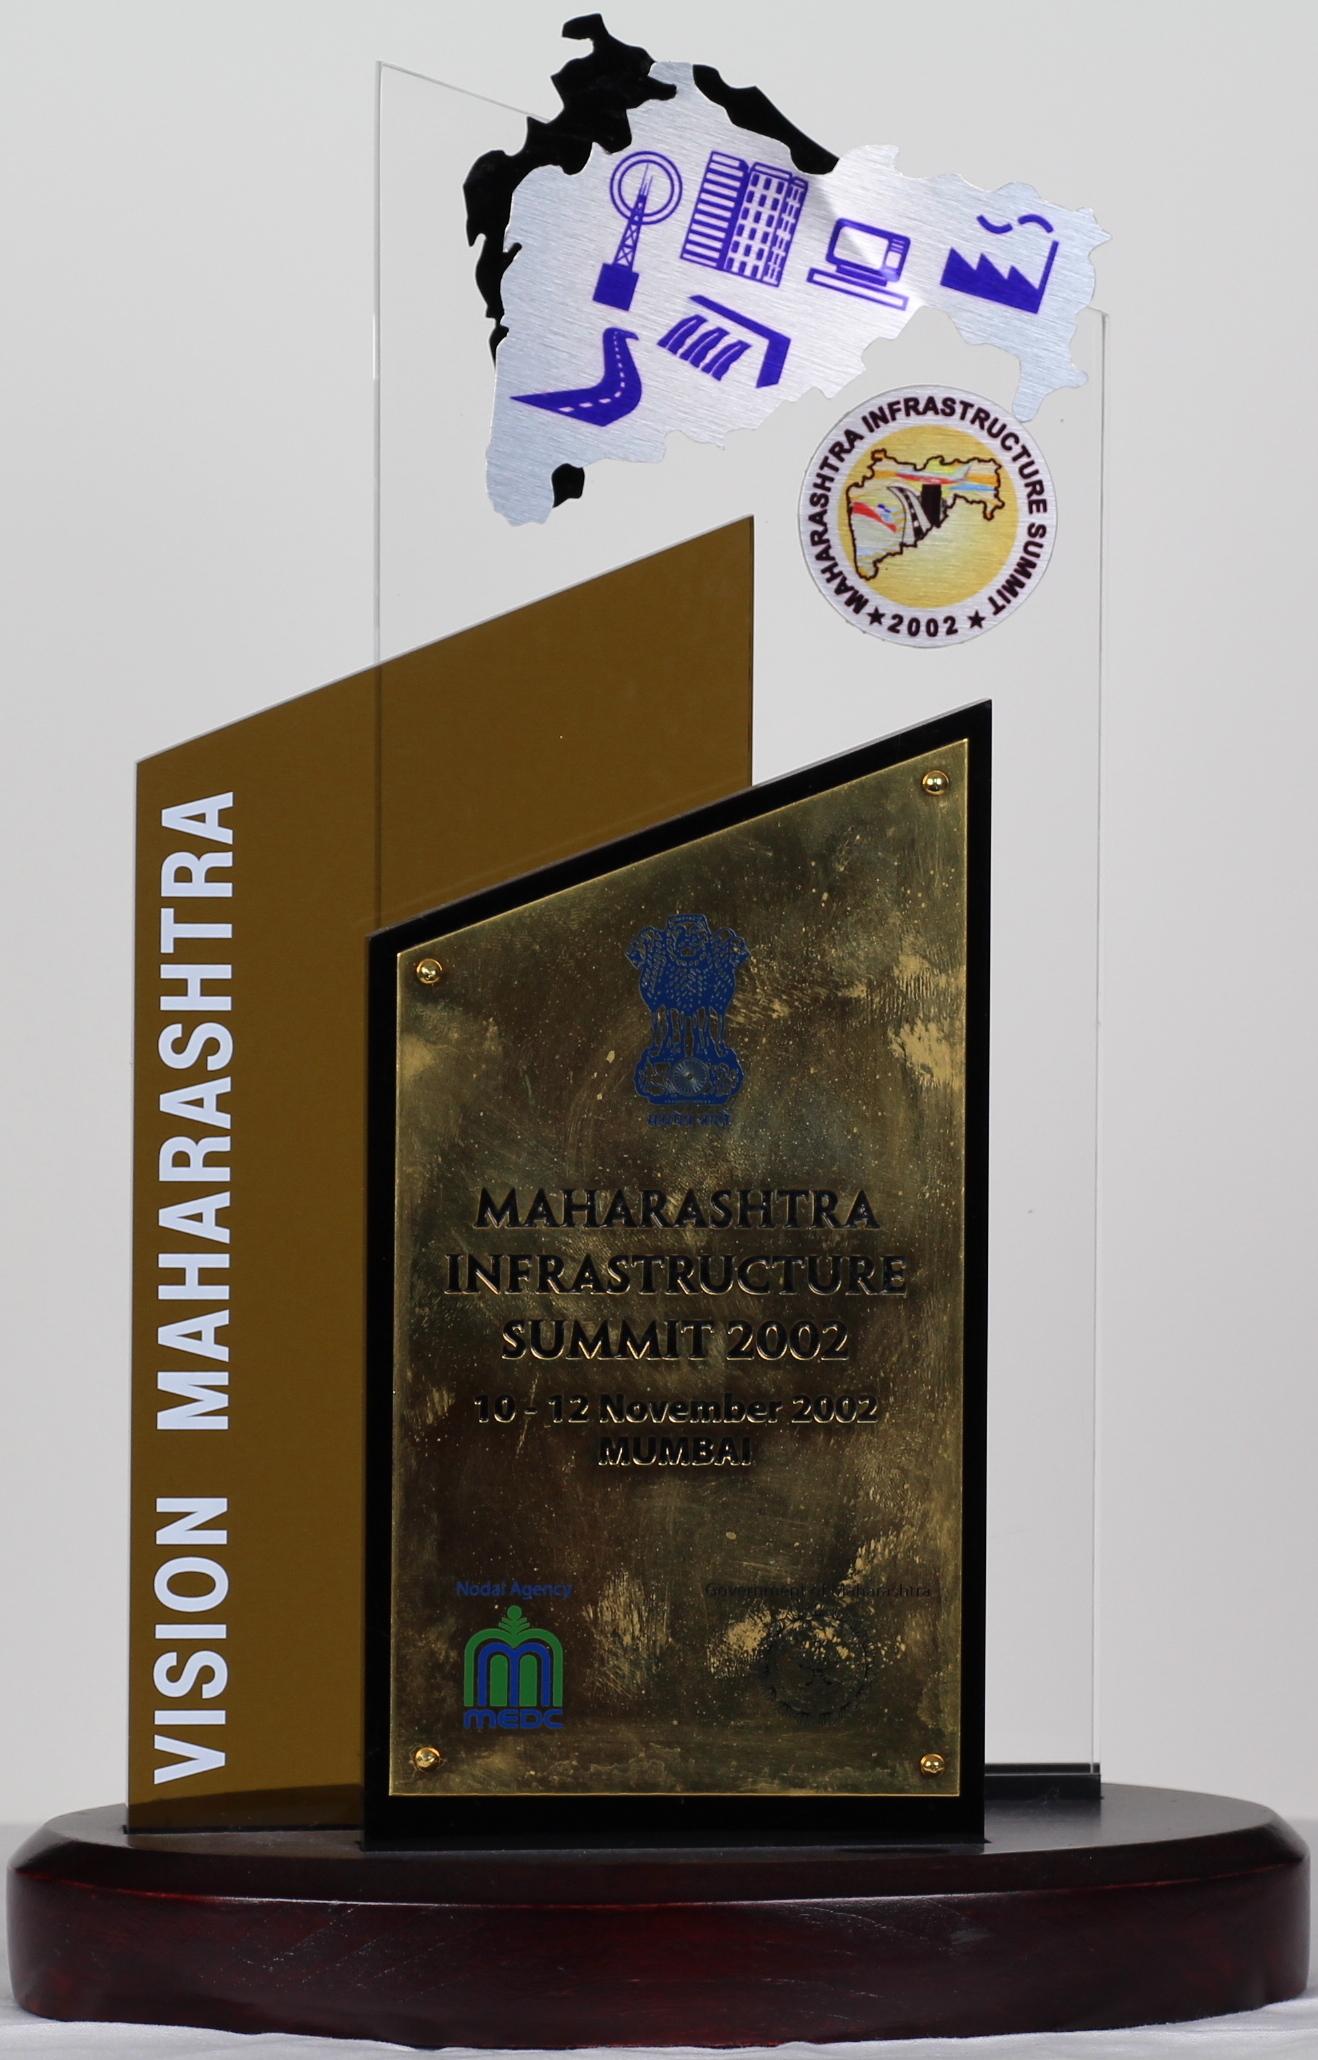 Recognition Award, Vision Maharashtra, Summit 2002, Mumbai